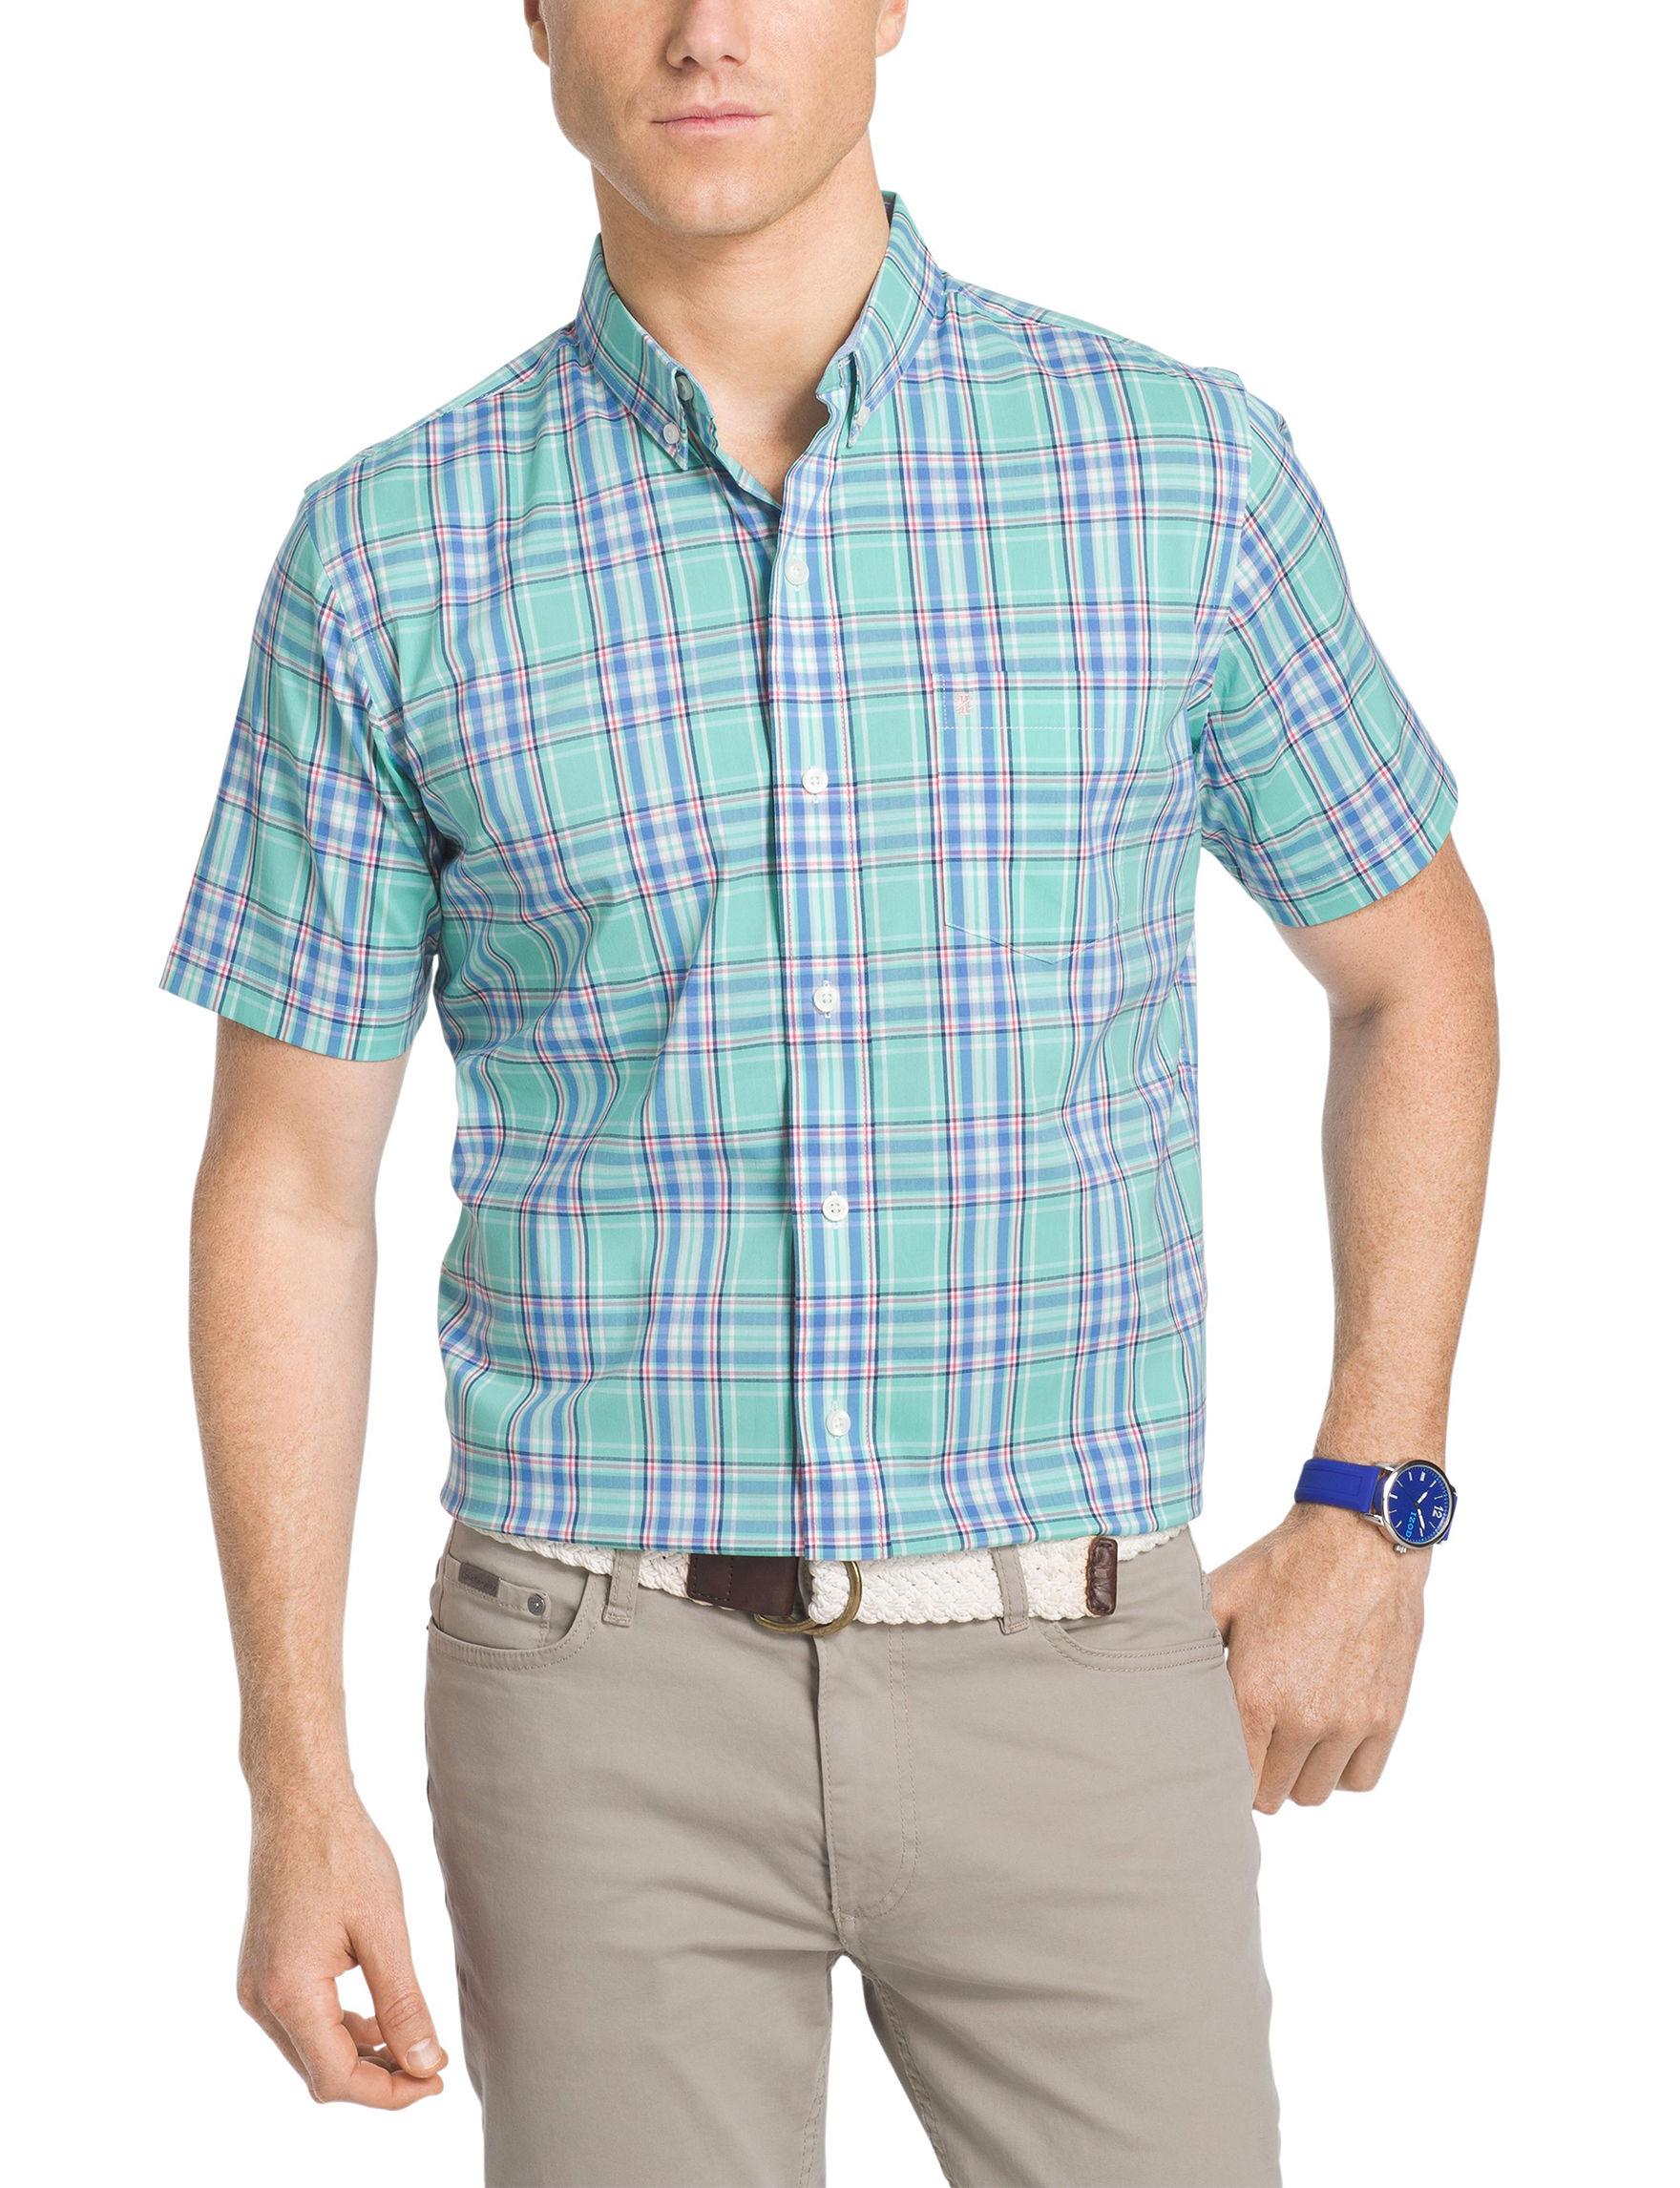 Izod Cascade Casual Button Down Shirts